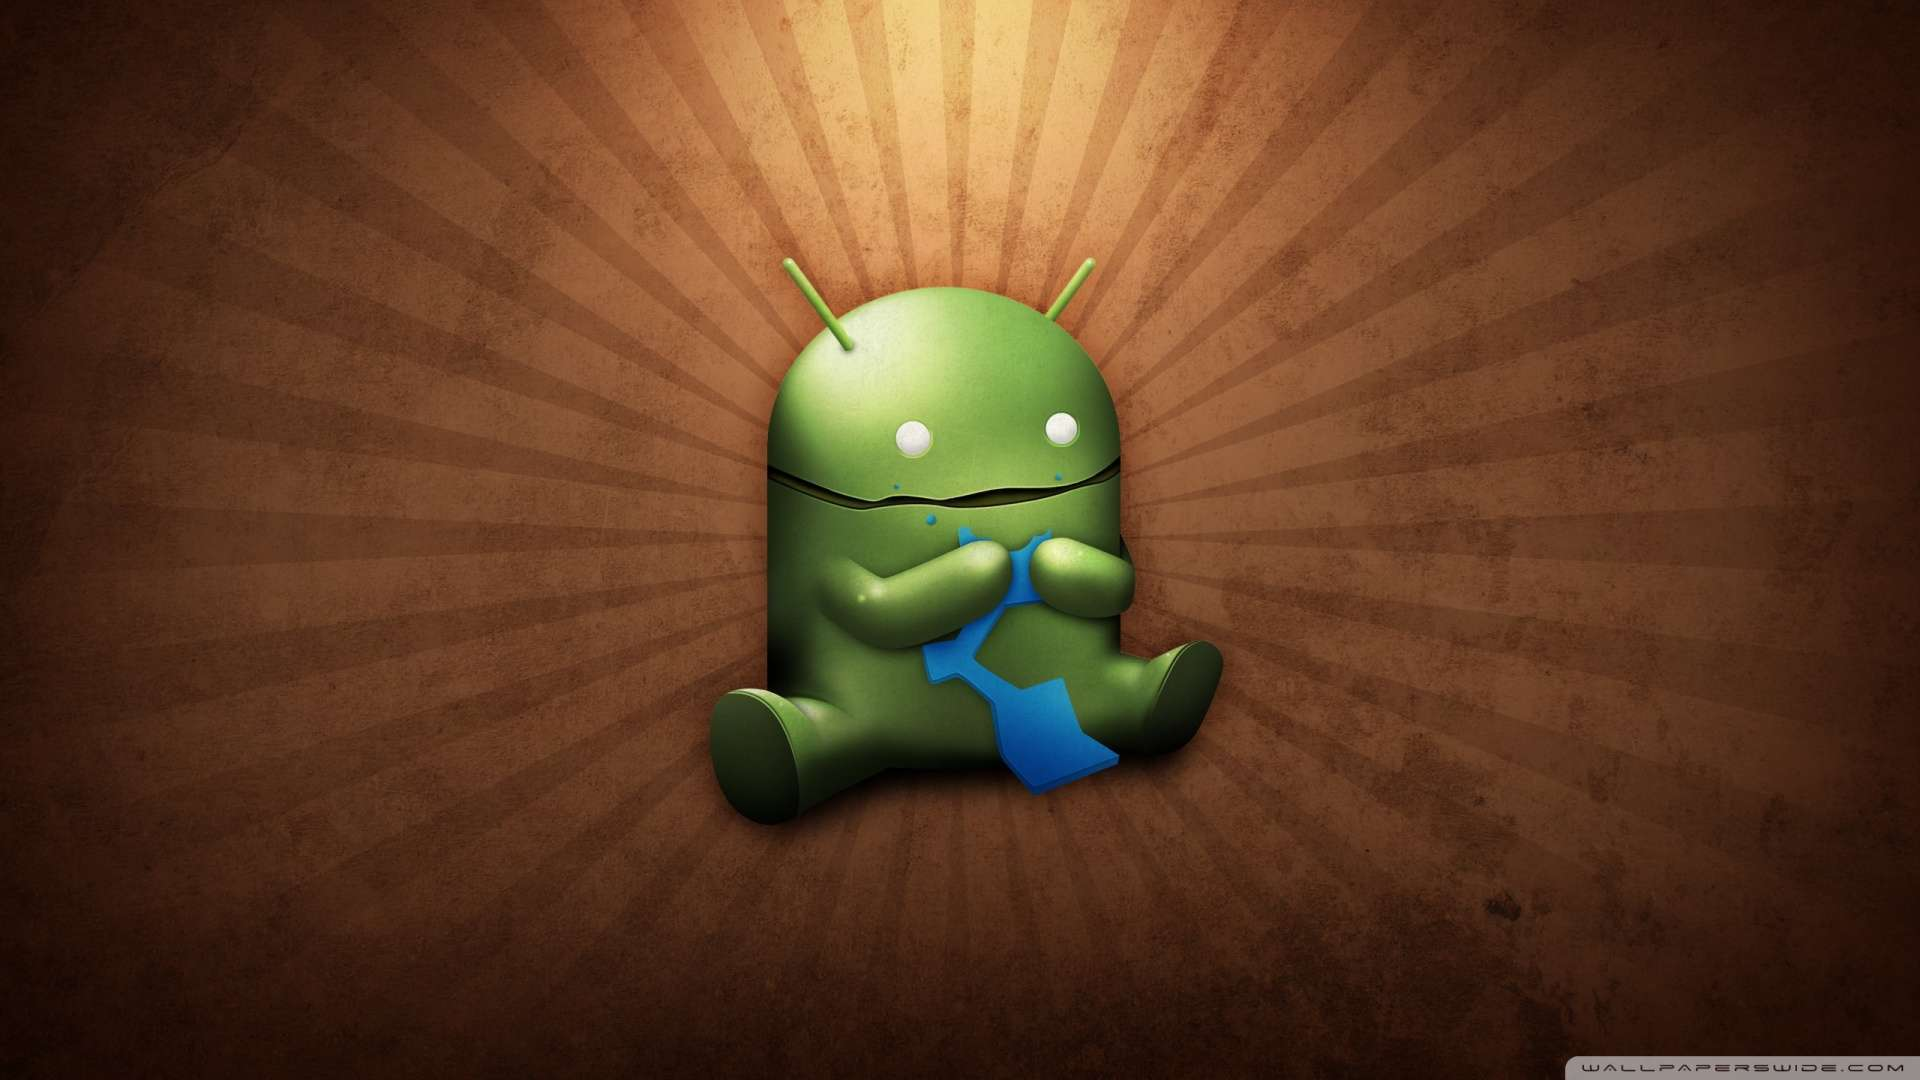 Wallpaper Funny Android Robot Wallpaper 1080p HD Upload at January 8 1920x1080